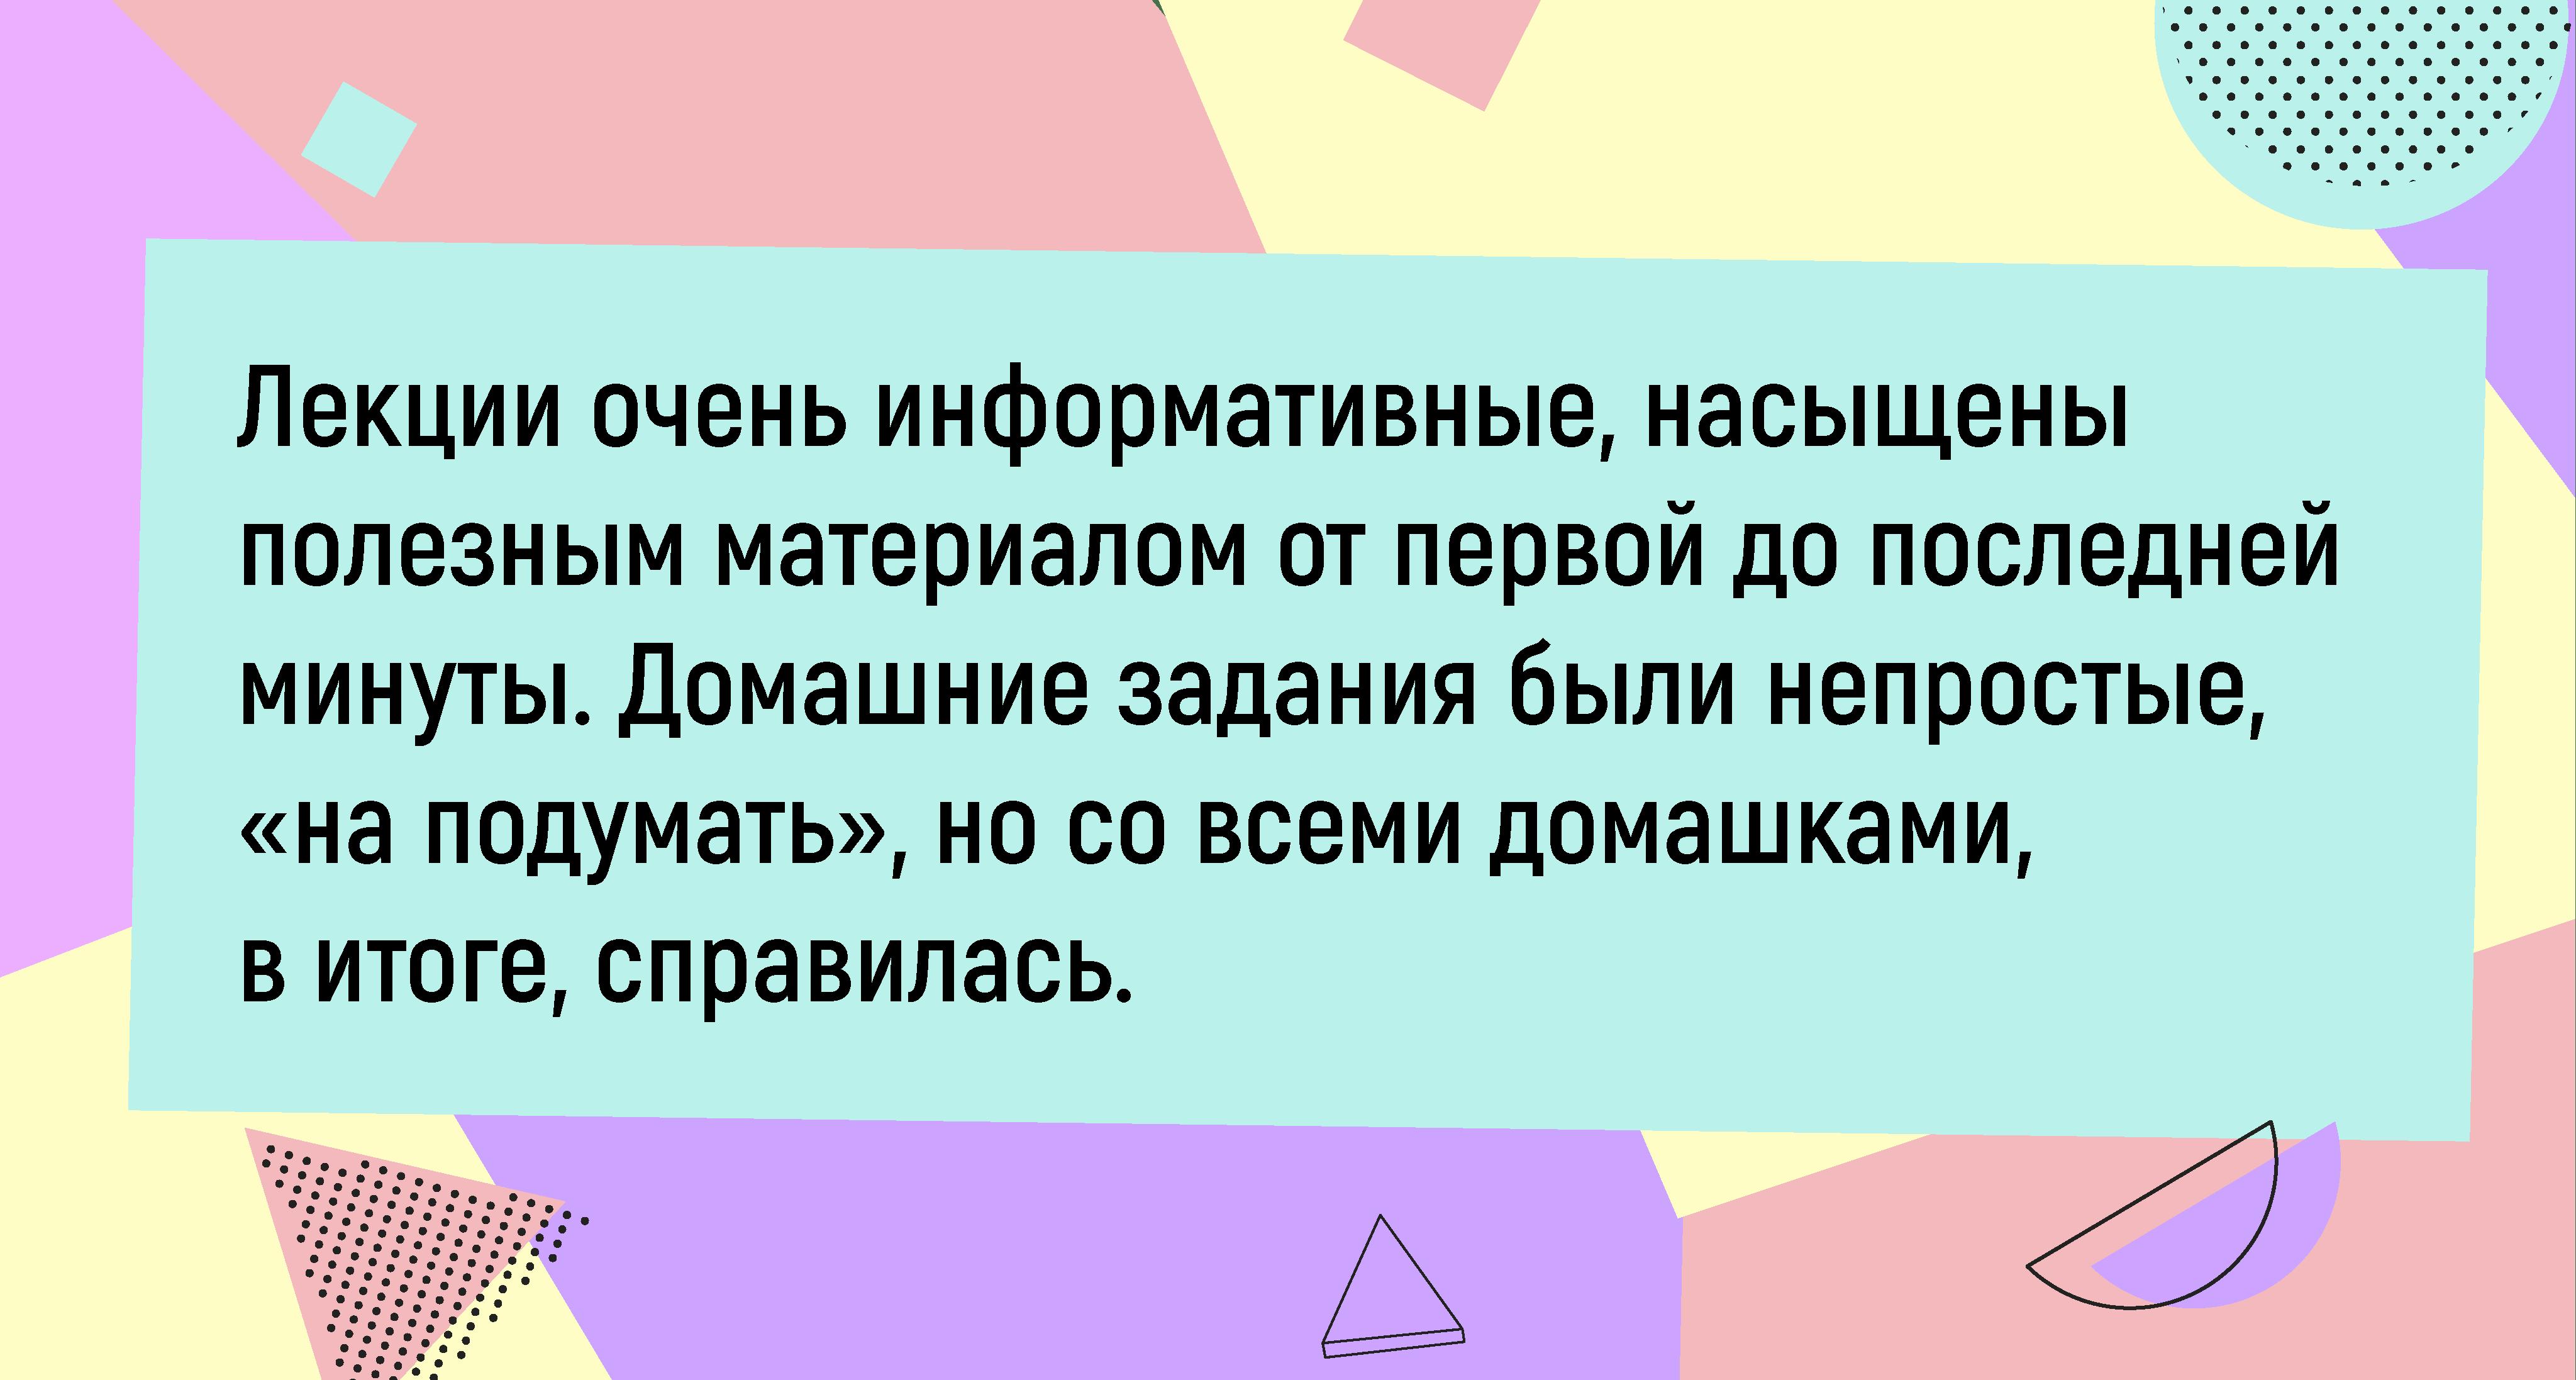 Как Влада Василенко стала бизнес-аналитиком в IT-компании 2